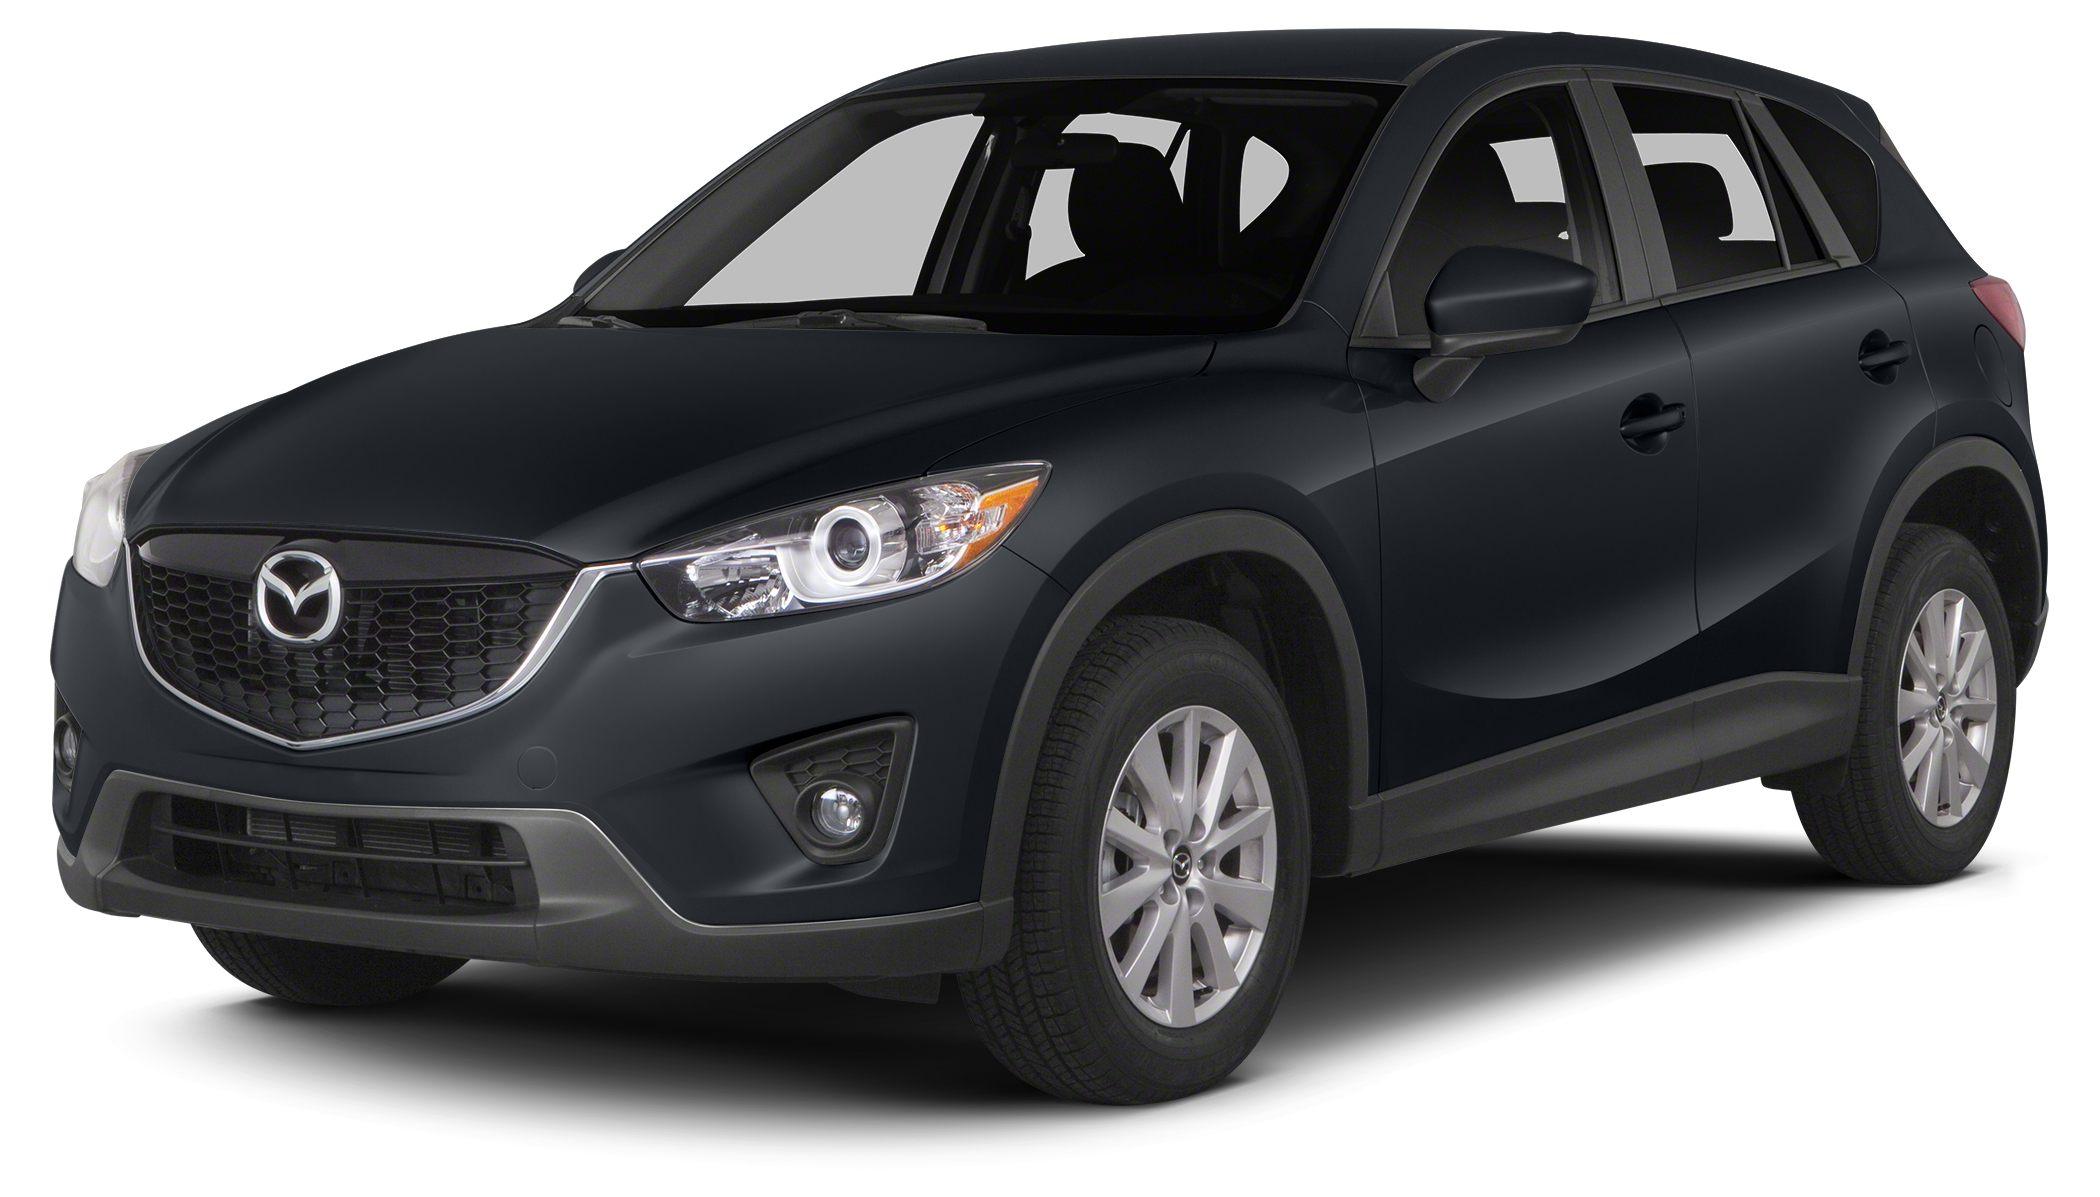 2013 Mazda CX-5 Touring Outstanding design defines the 2013 Mazda Mazda CX-5 It offers the latest